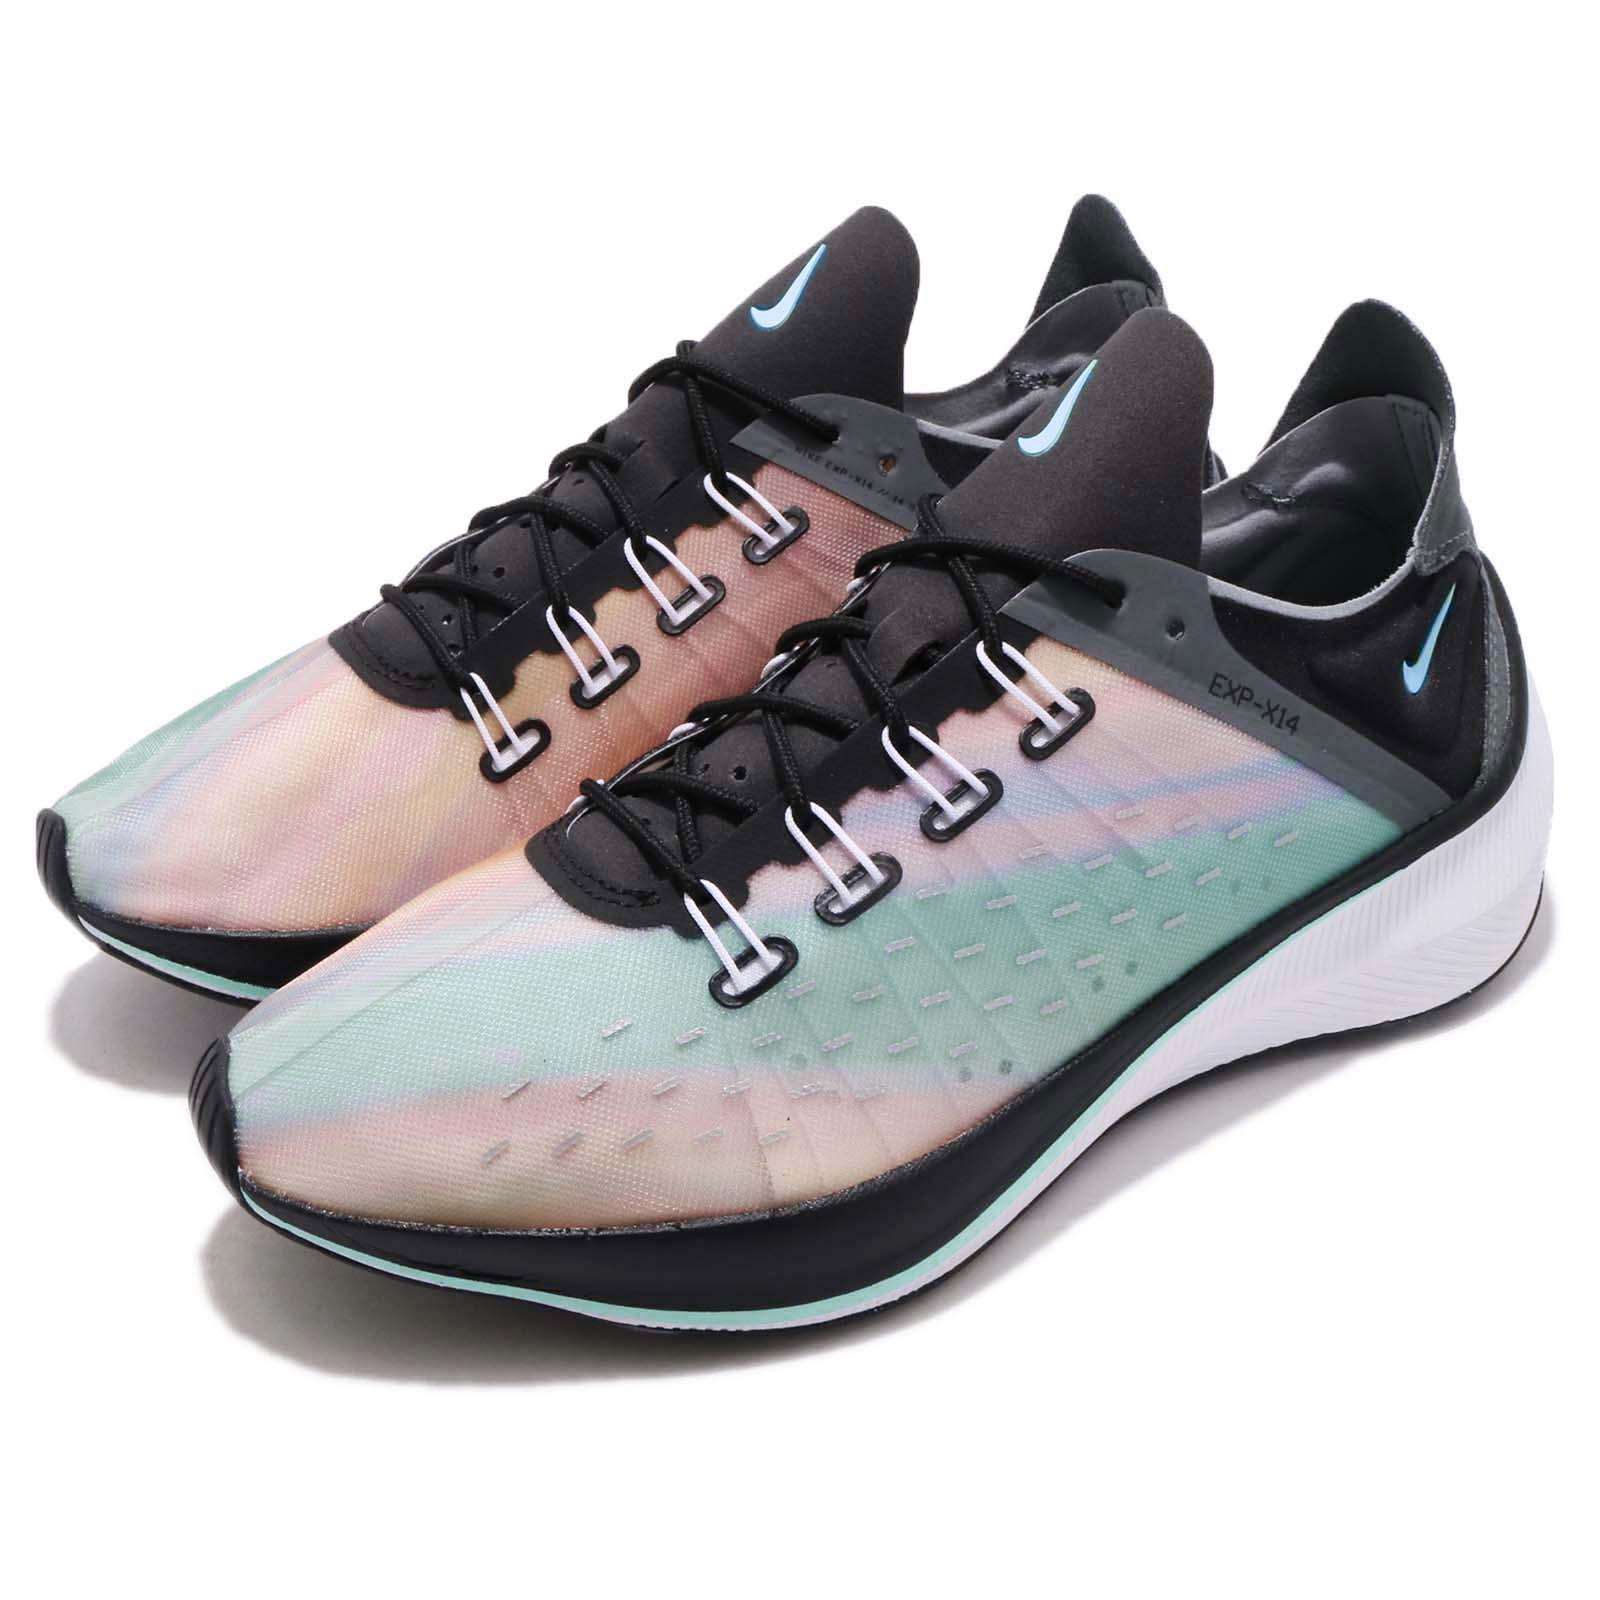 186ec8ba71f4 Details about Nike EXP-X14 QS Sunset Black Grey White Men Running Shoes  Sneakers BQ6972-001